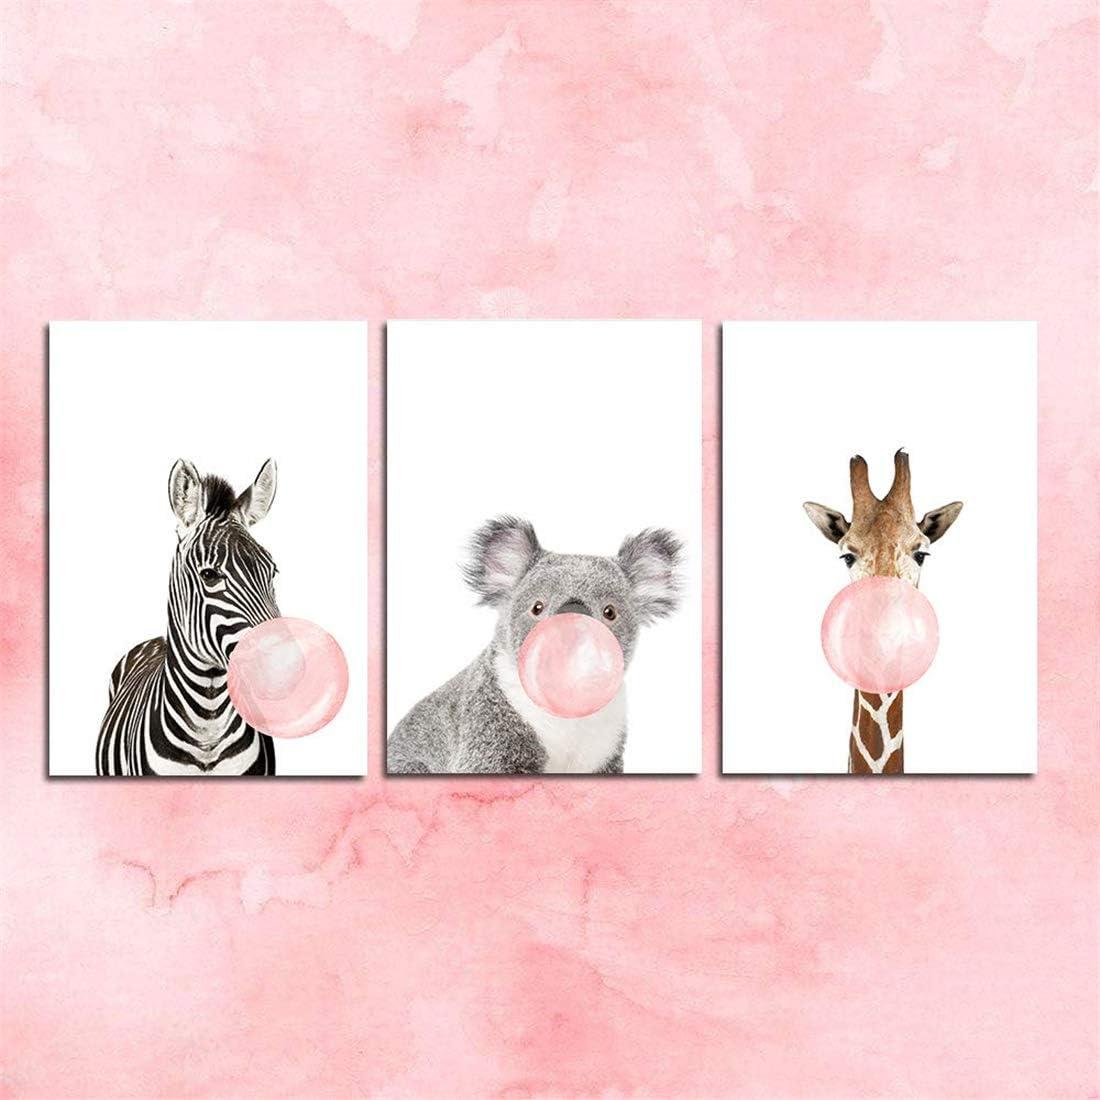 Baby Infant Kids Animal Zebra Giraffe Bubble Gum Print Painting Canvas Poster